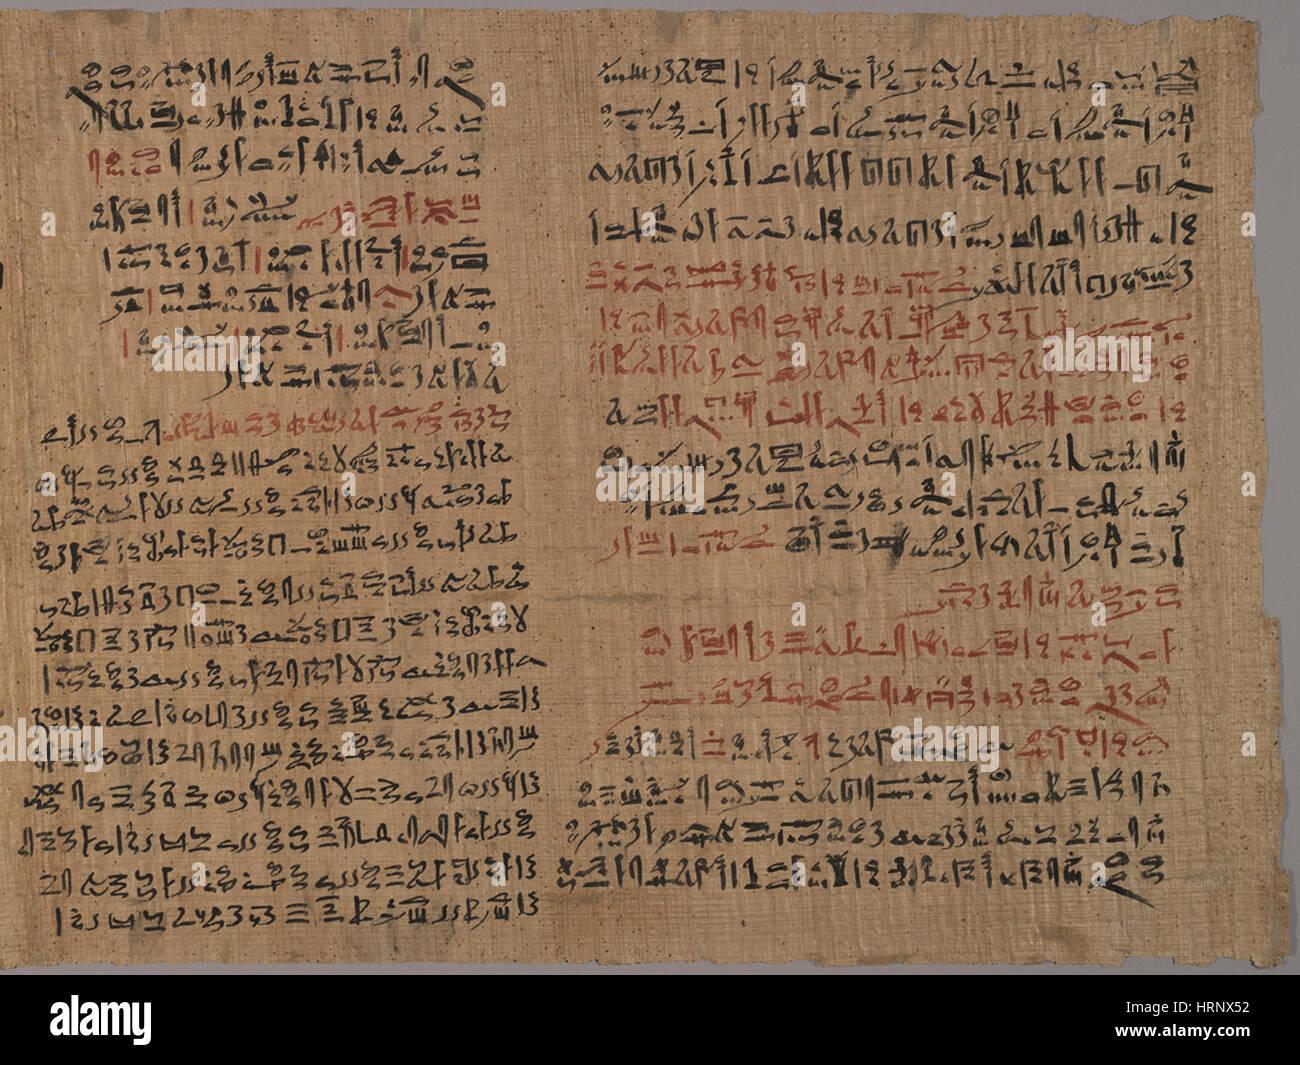 Edwin Smith Papyrus, 1500 BC - Stock Image